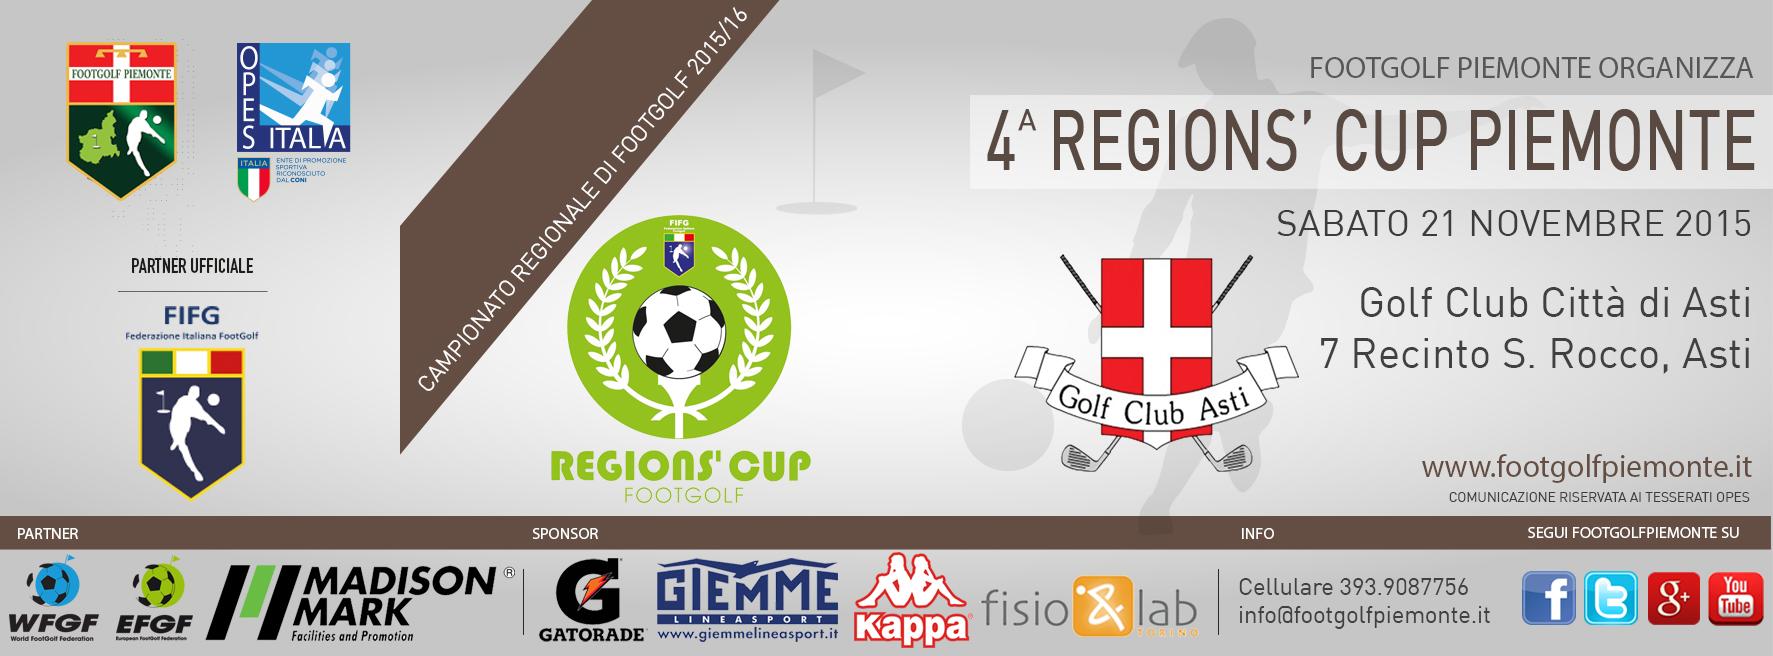 Locandina 4 tappa Regions' Cup Footgolf Piemonte 2015:2016 Asti AT sabato 21 novembre 2015